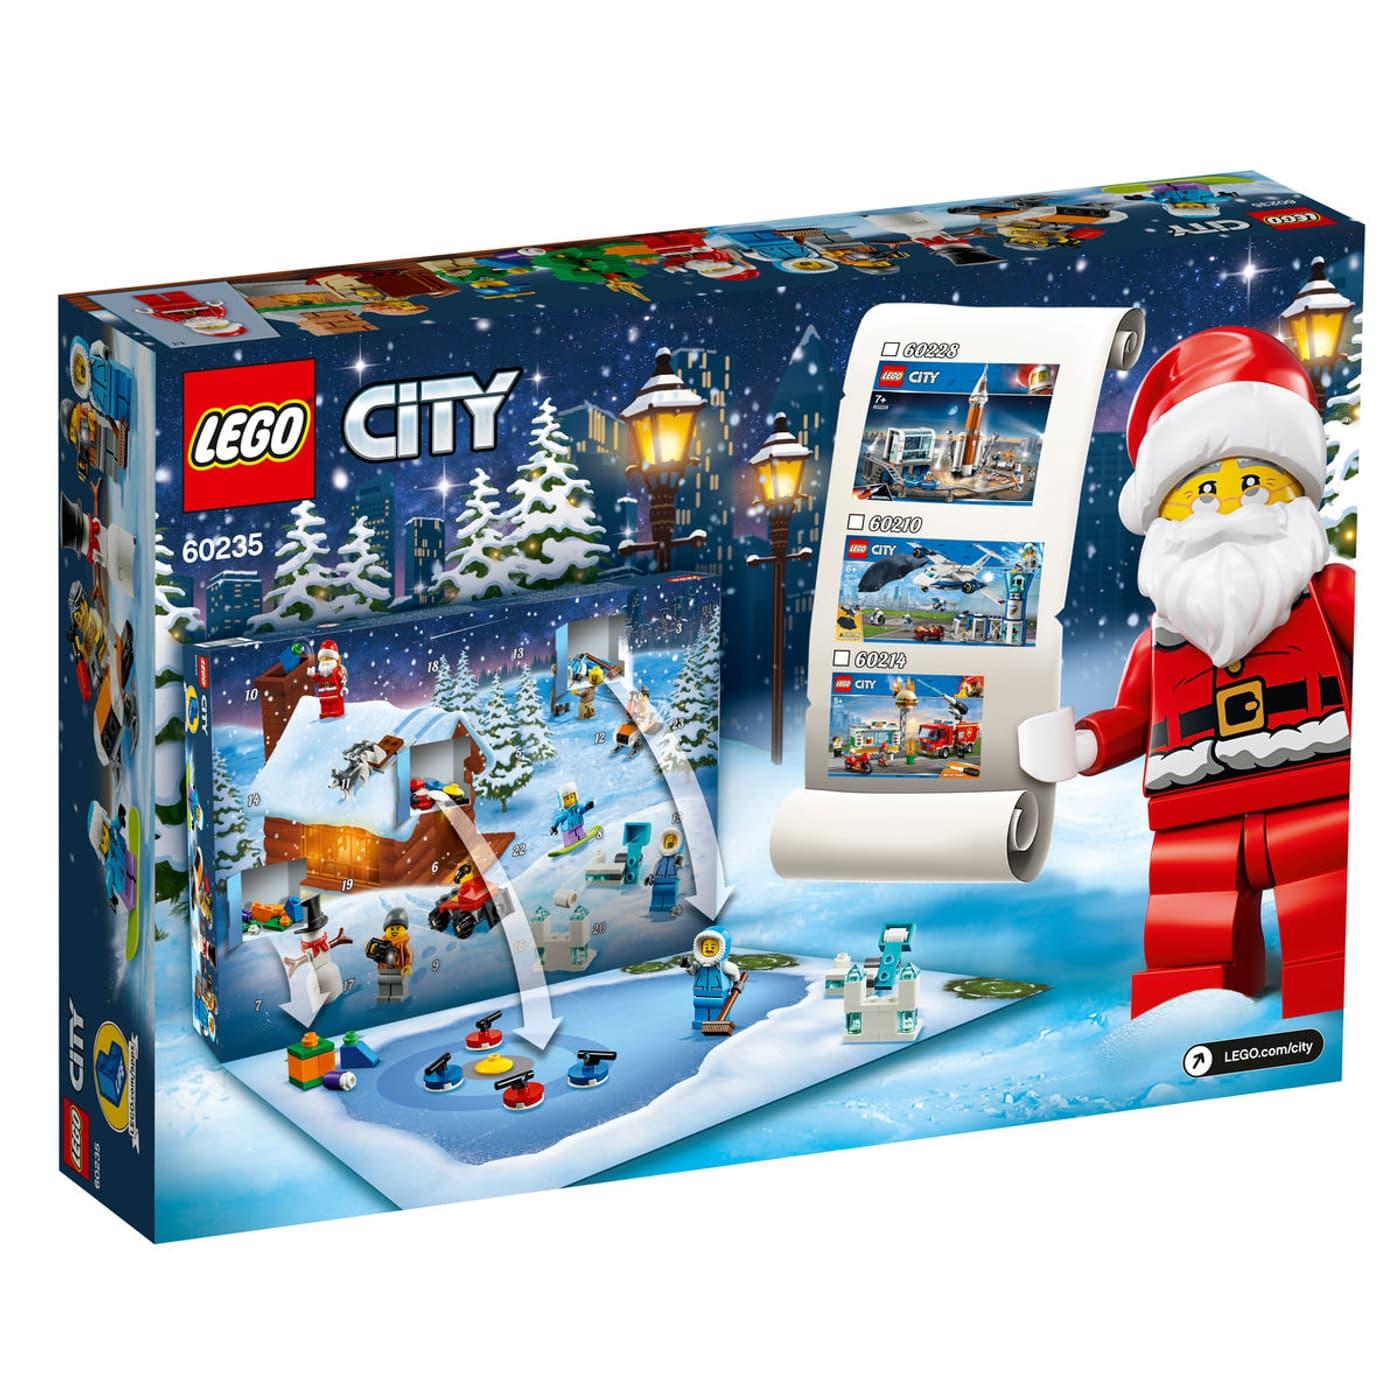 Calendrier City.Migros Calendrier De L Avent Lego City